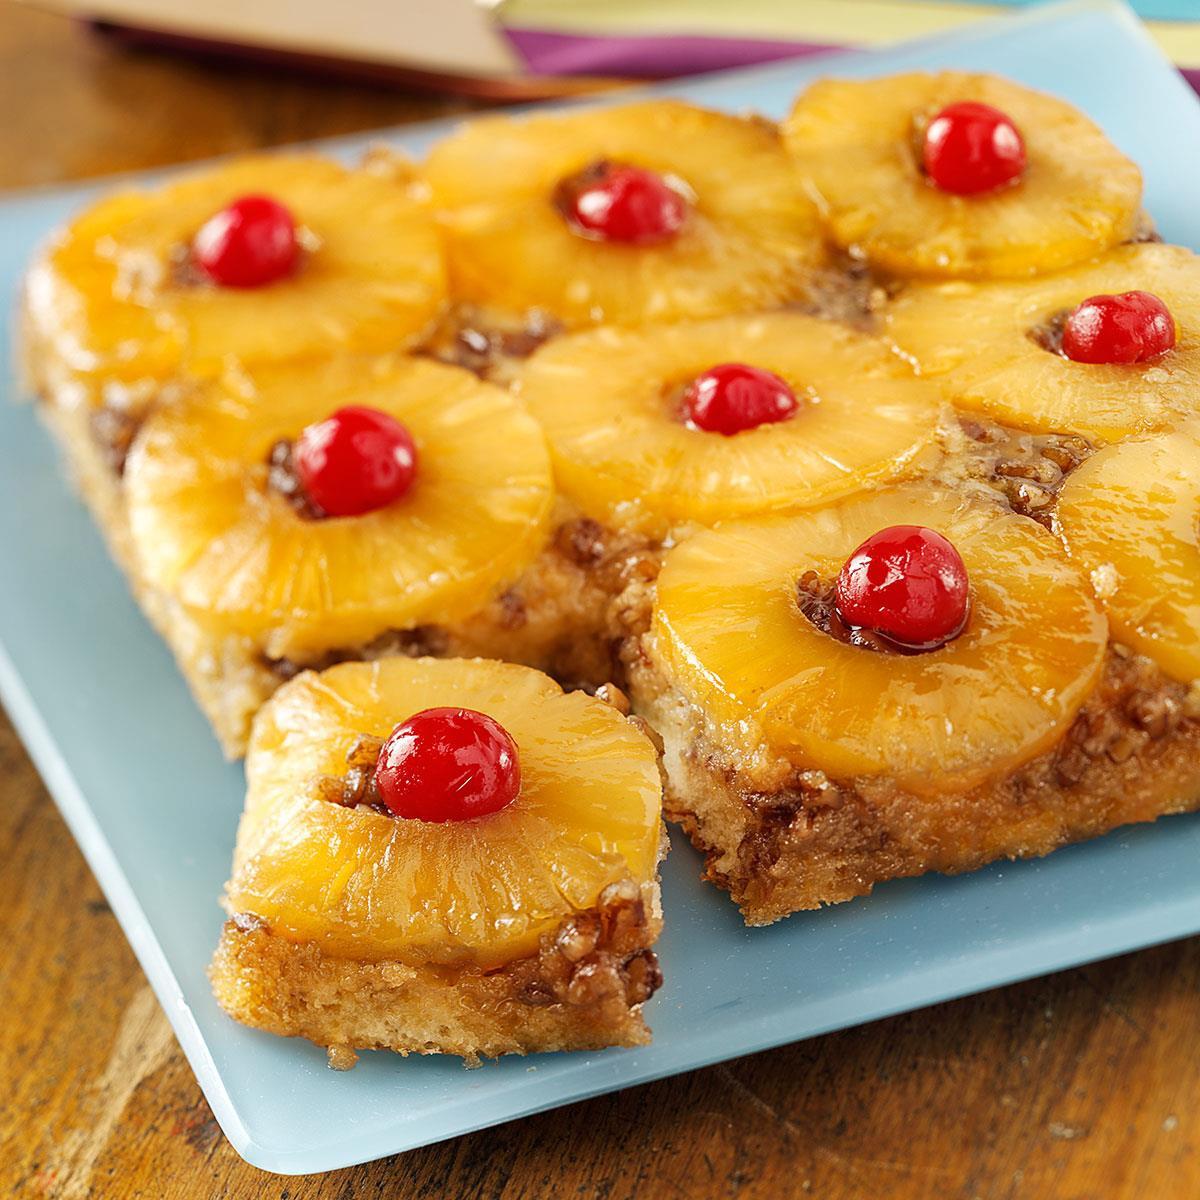 Pineapple Upside Down Cake Recipe  Classic Pineapple Upside Down Cake Recipe